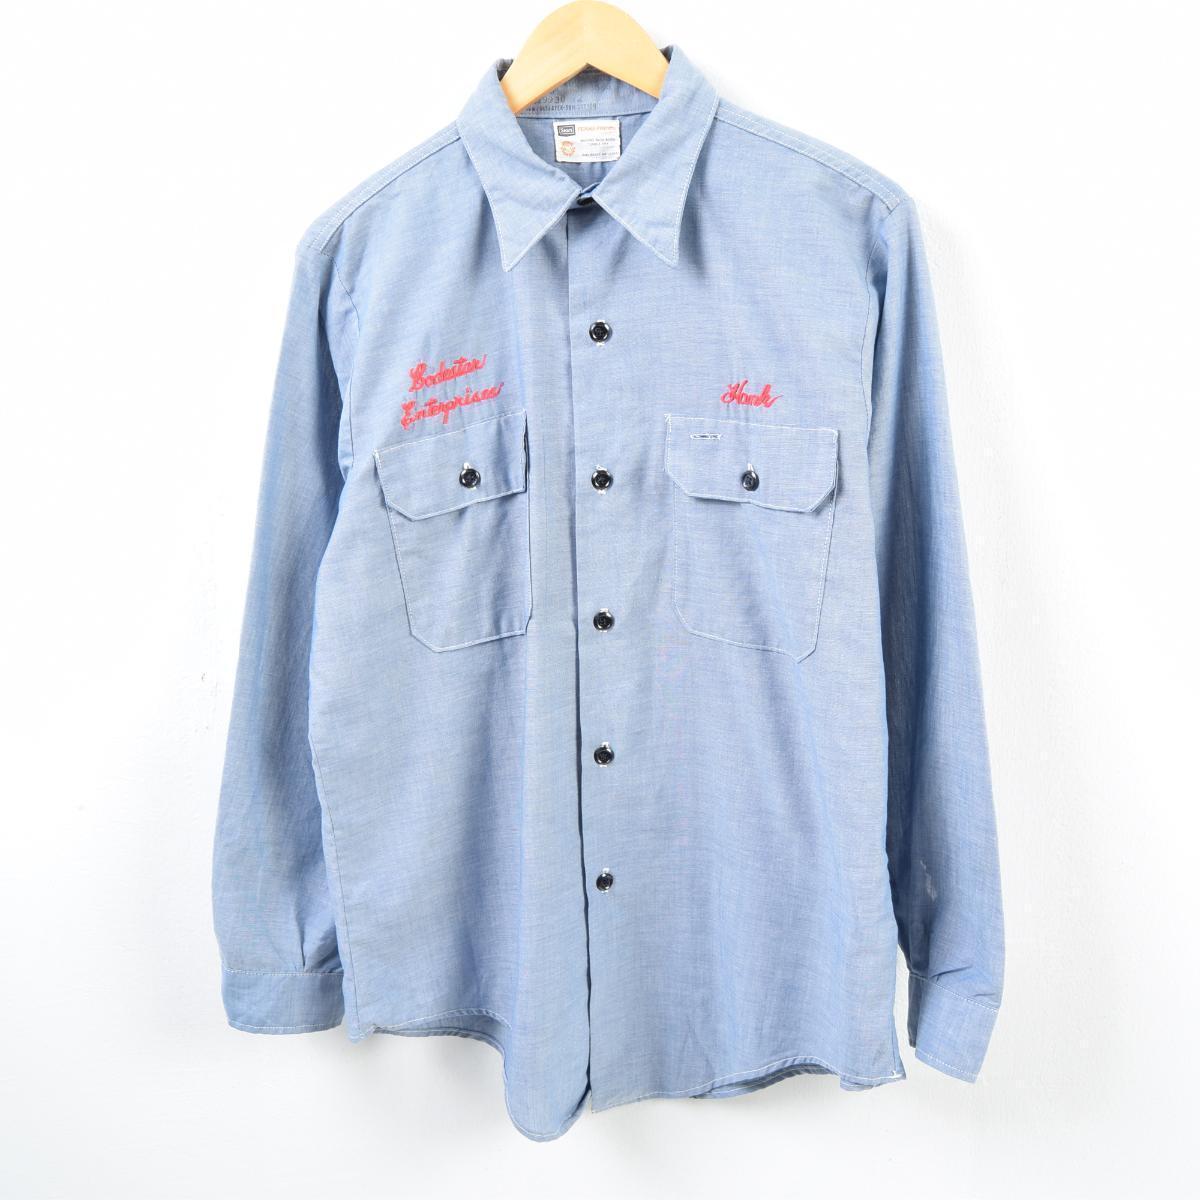 35a2ee70 60-70 generation Sears Sears long sleeves work shirt men M vintage /wbc7029  ...